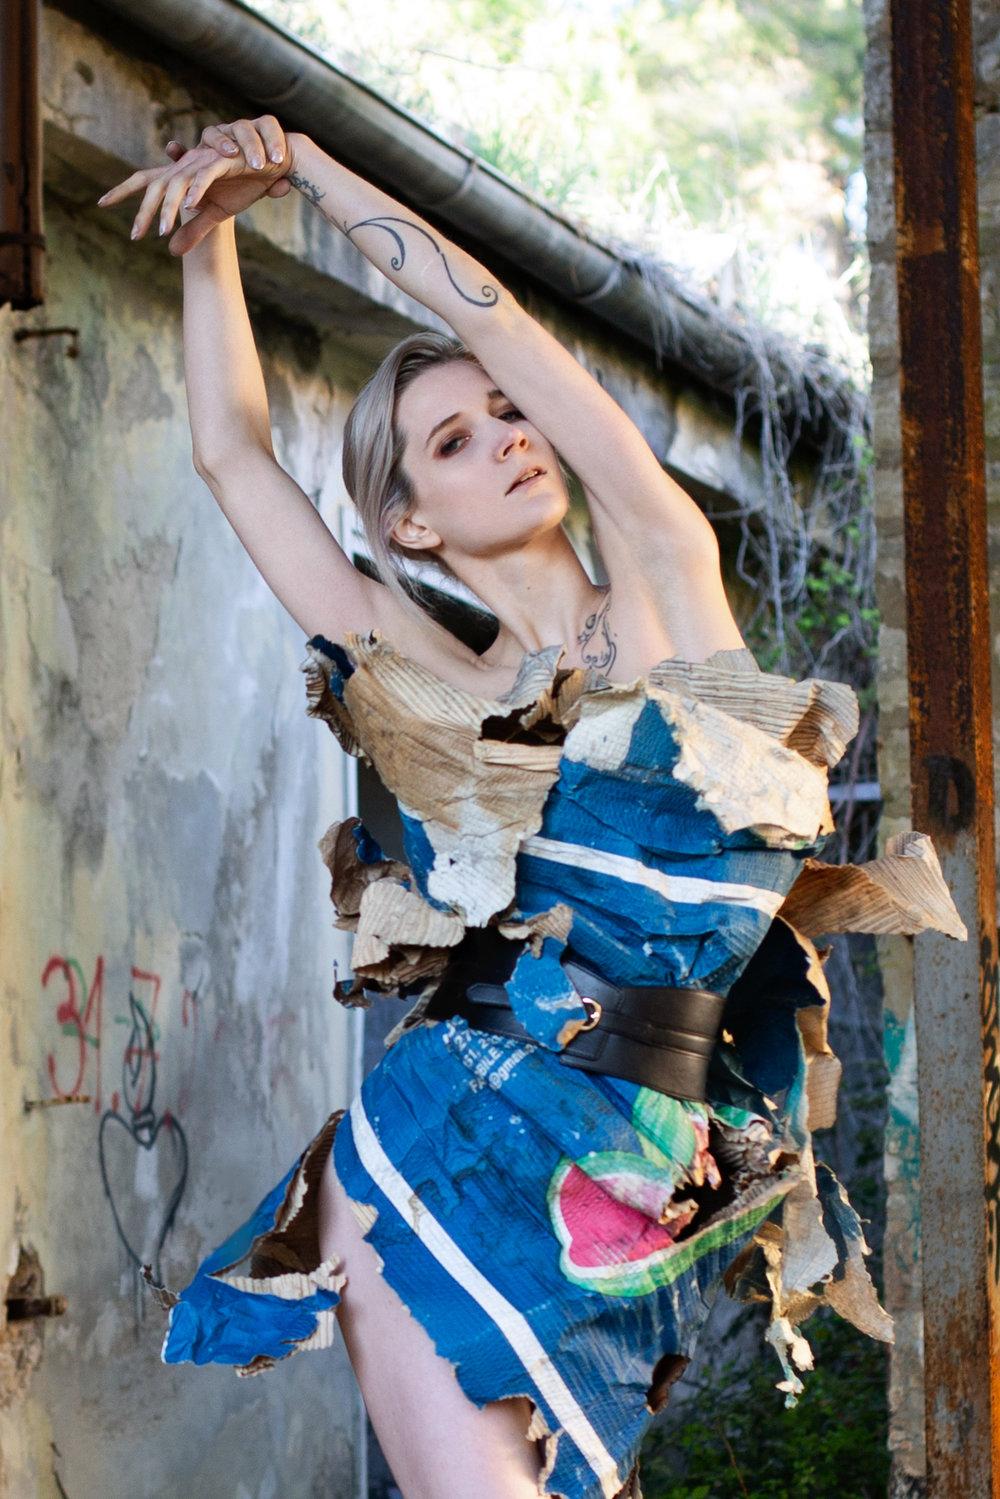 Roxanna Walitzki, shot by Redd Walitzki, at Pula's abandoned naval base, wearing discarded paper.